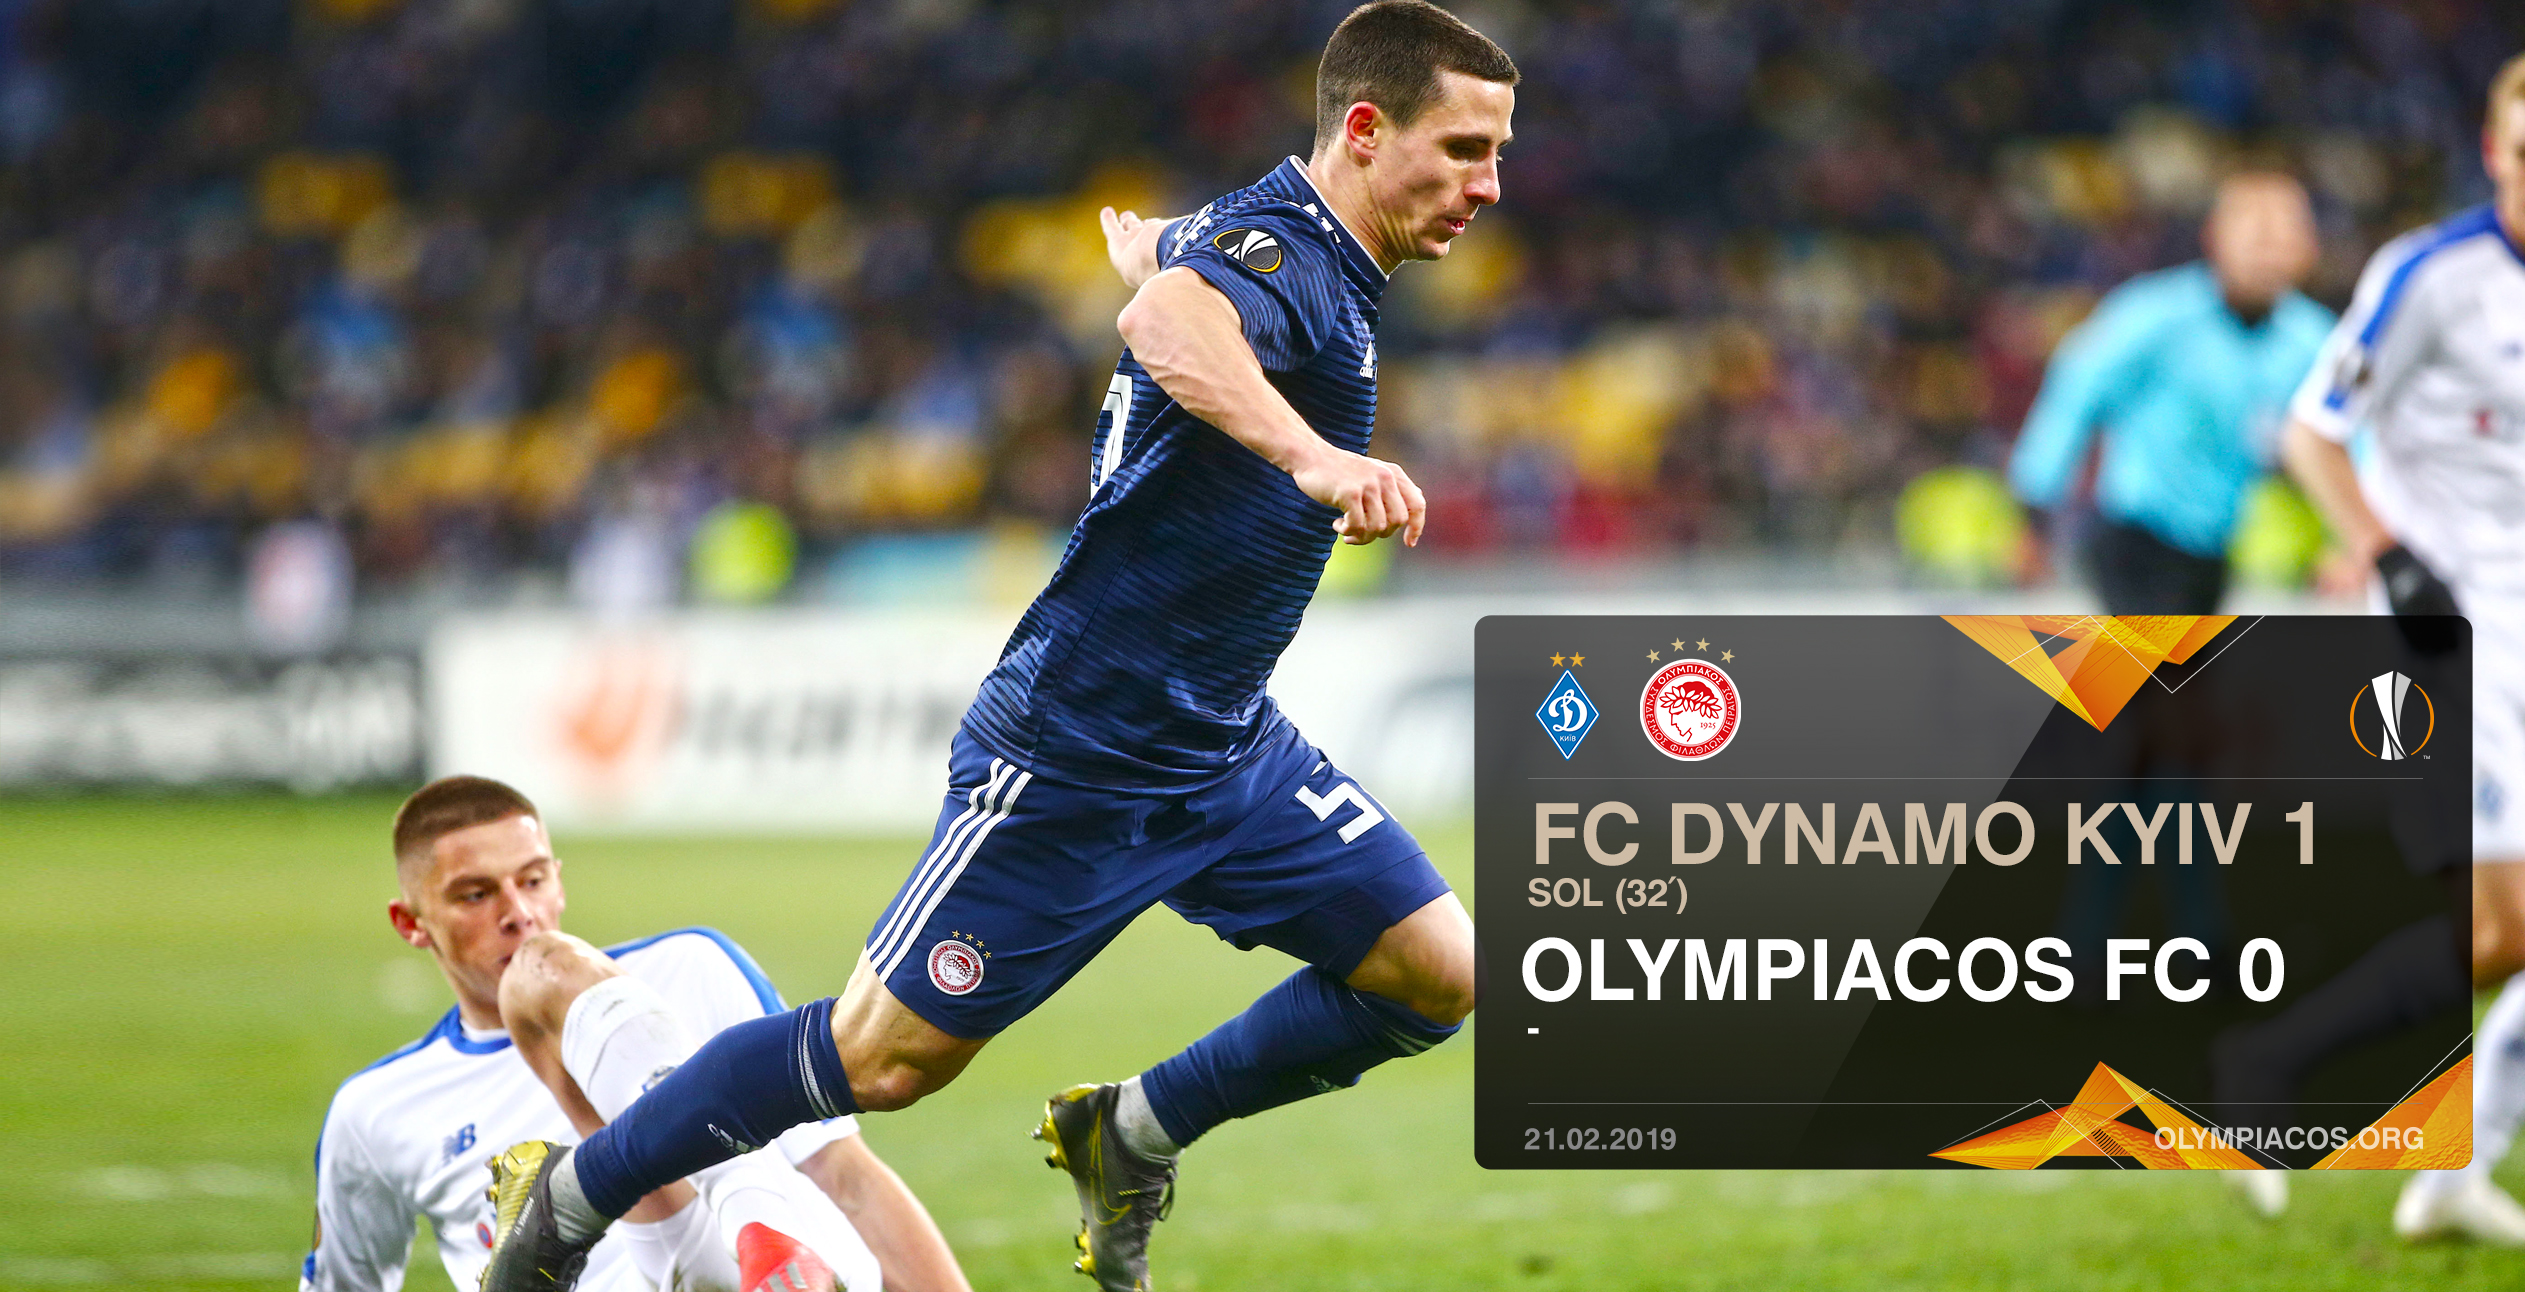 Dínamo Kiev – Olympiacos 1-0